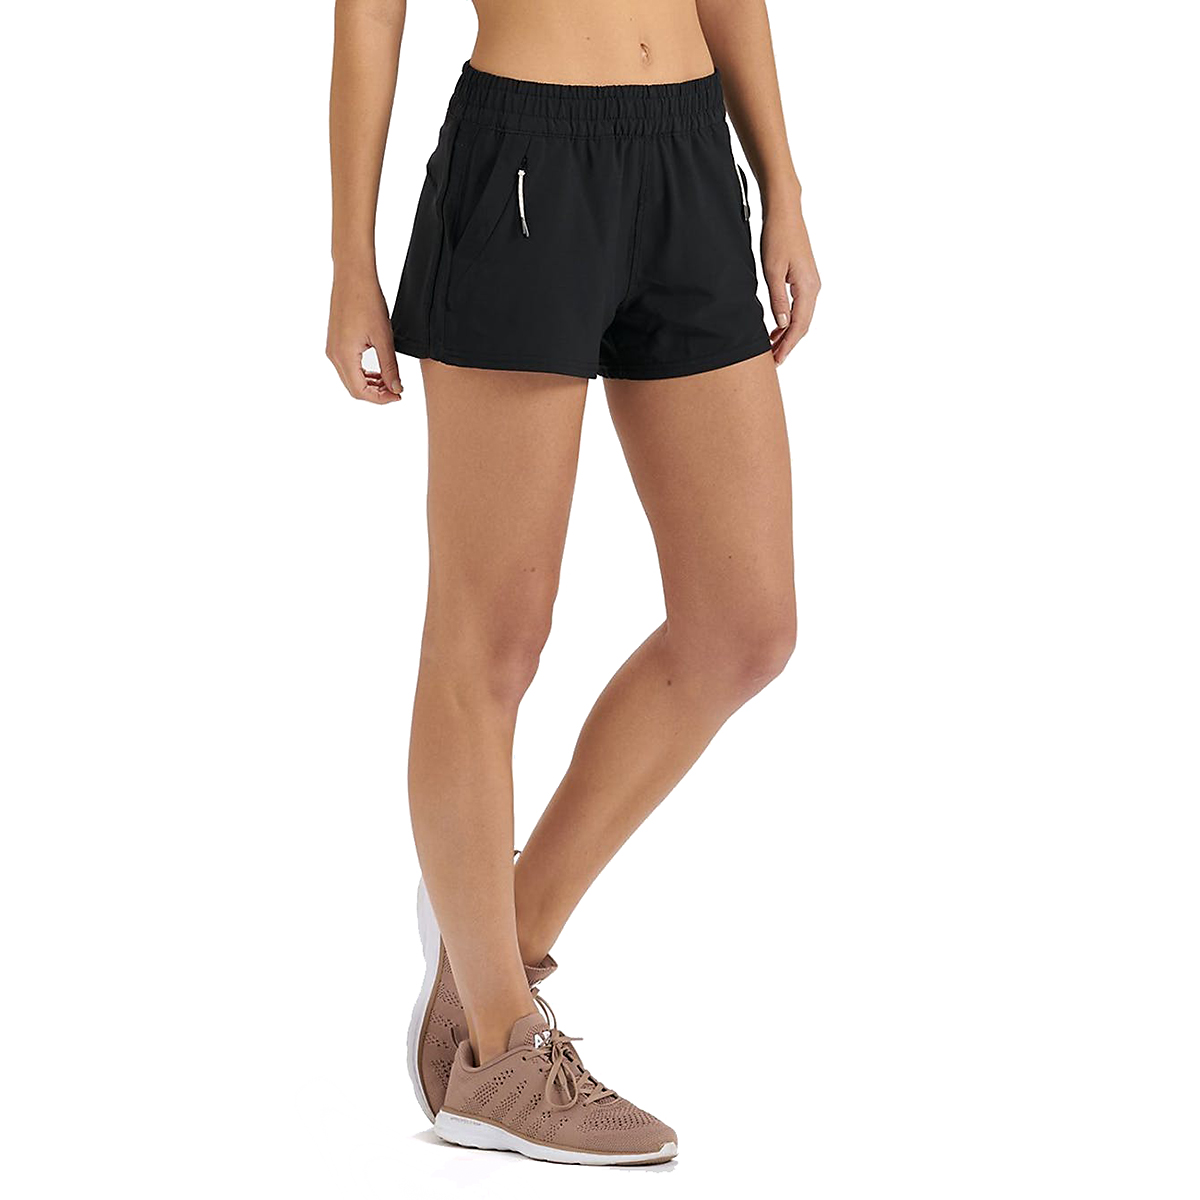 Women's Vuori Dash Short  - Color: Black - Size: XS, Black, large, image 2